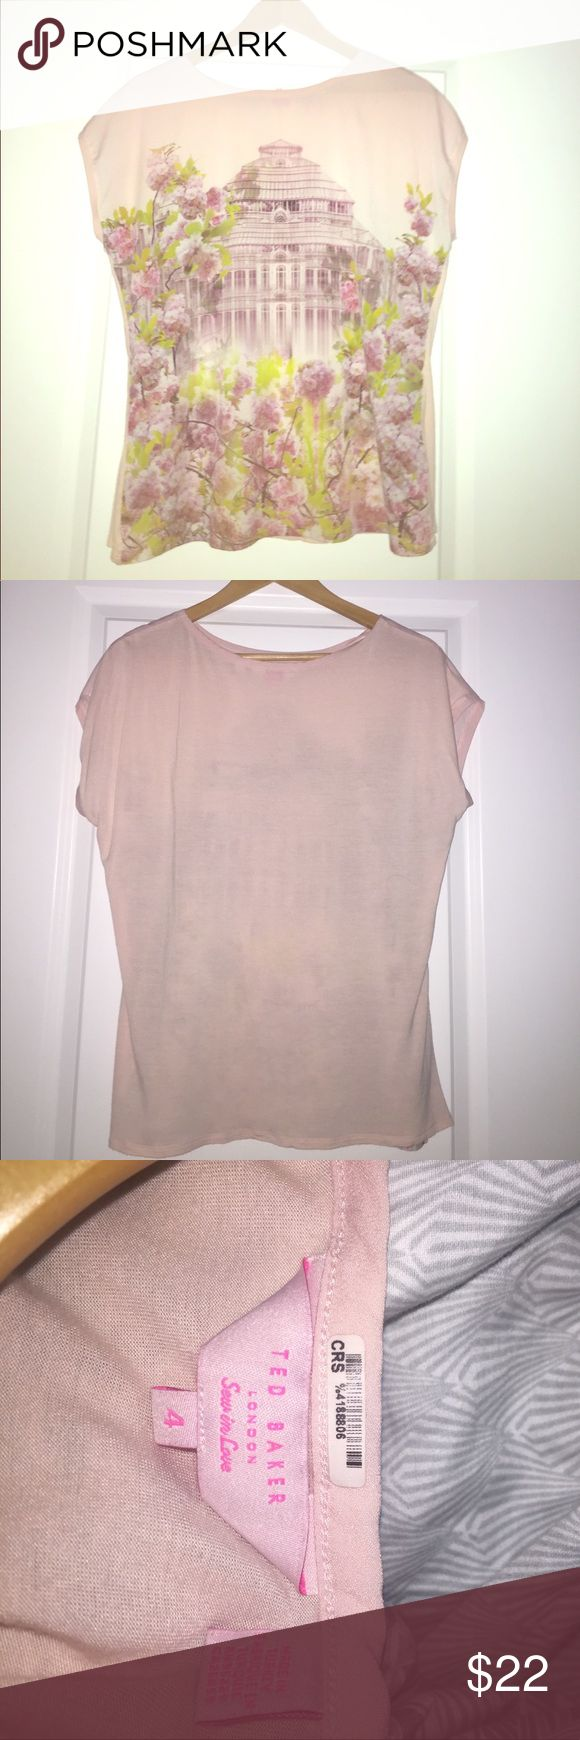 Size 4 Ted Baker London light pink women's t-shirt A gently worn size 4 Ted Baker London shirt. Perfect for summer. Ted Baker London Tops Tees - Short Sleeve